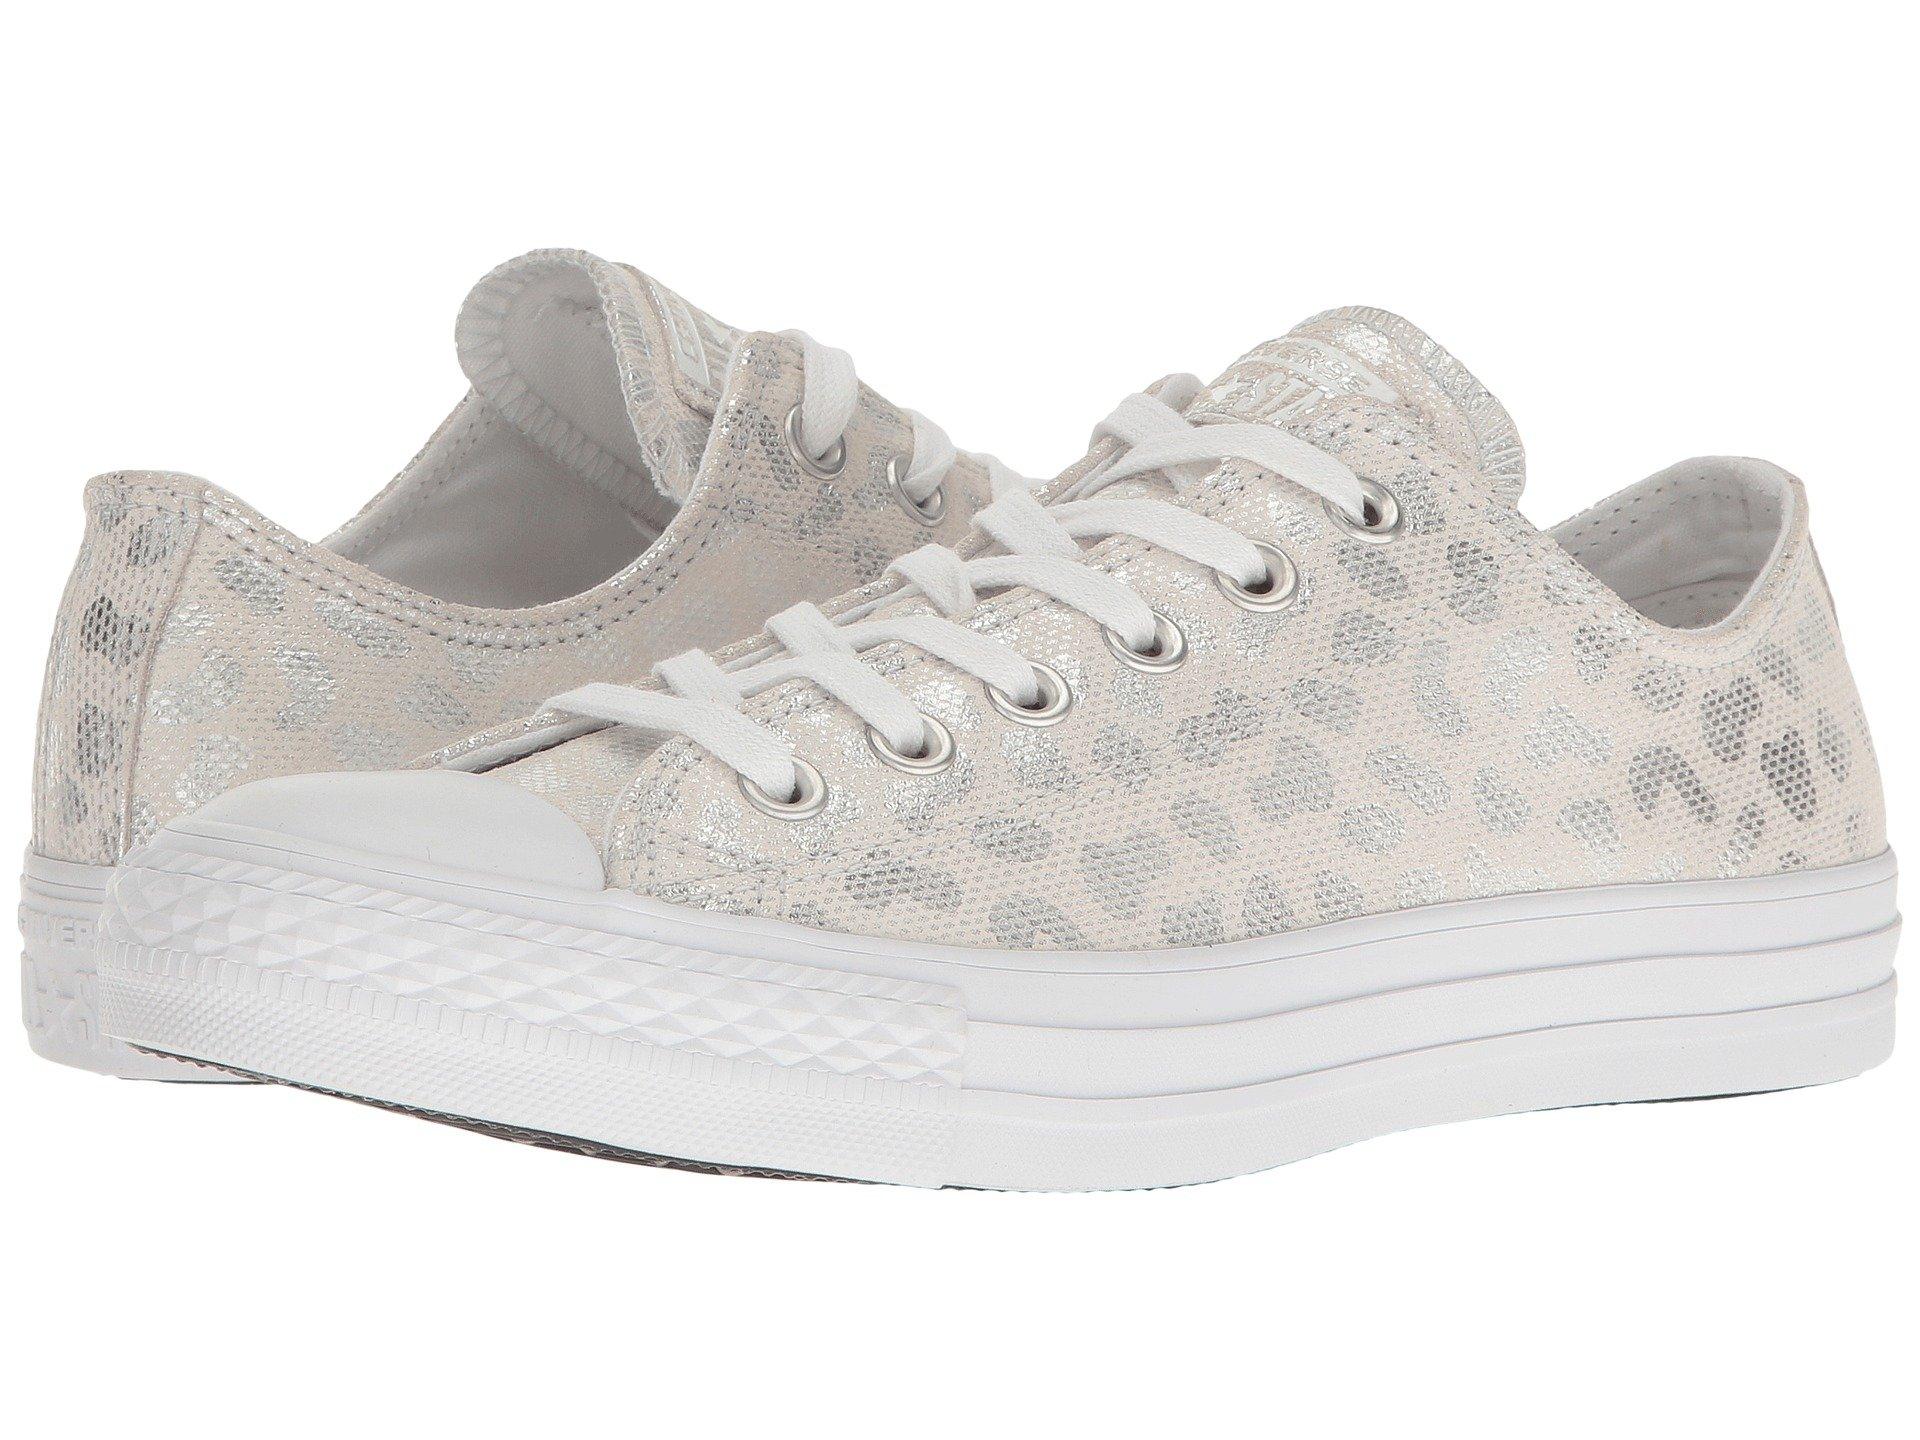 752f83d2241b Converse Chuck Taylor® All Star® Brea Animal Glam Textile Ox In White Silver